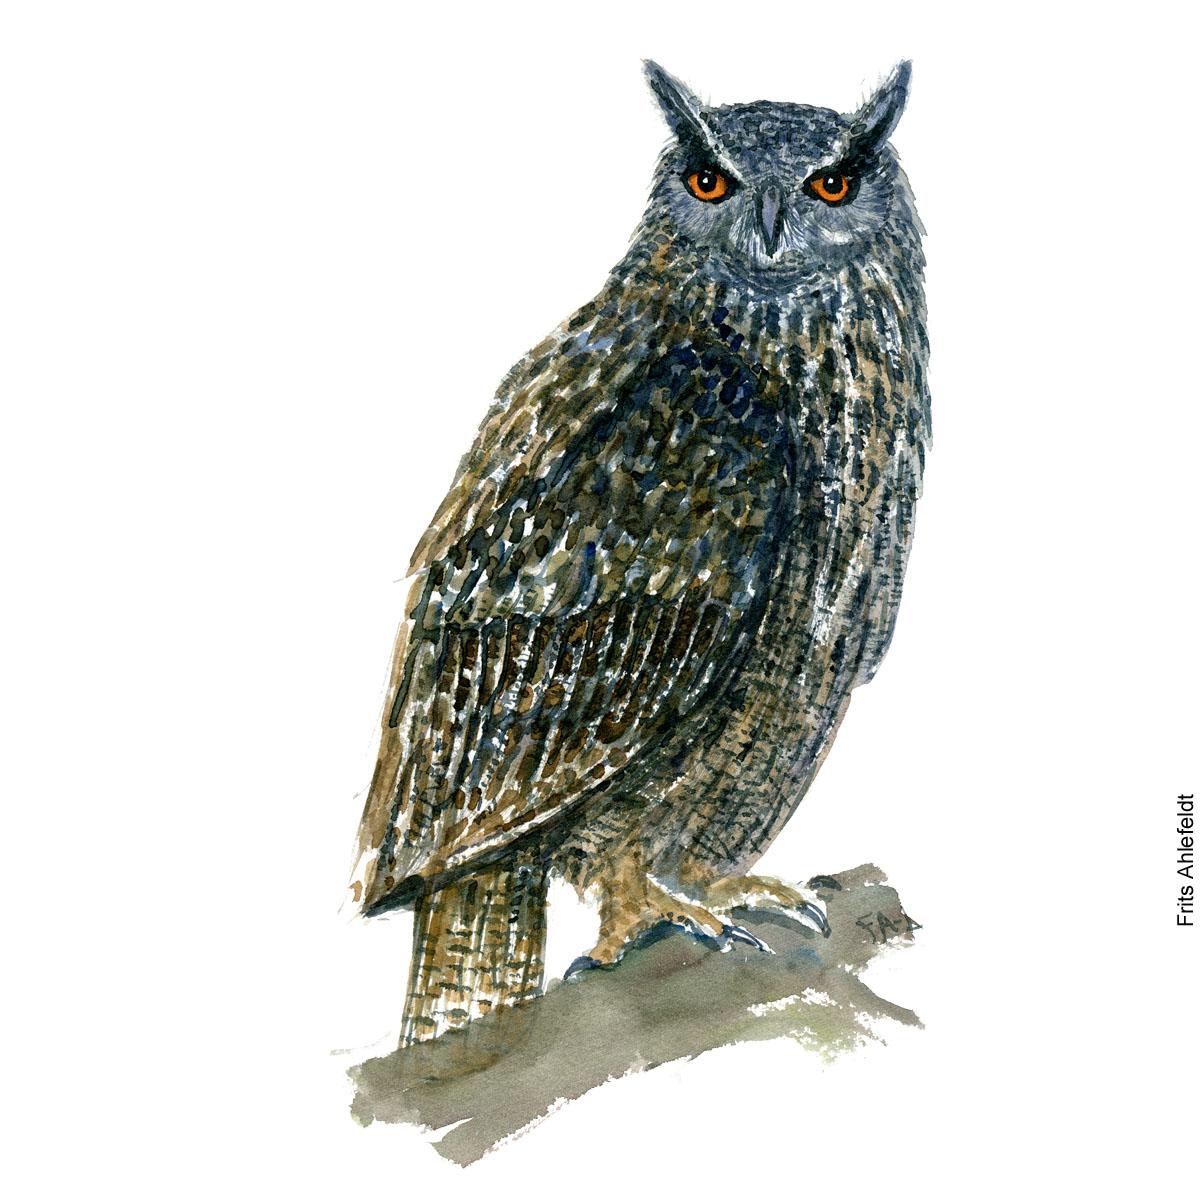 European eagle owl bird watercolor painting. Artwork by Frits Ahlefeldt. Fugle akvarel